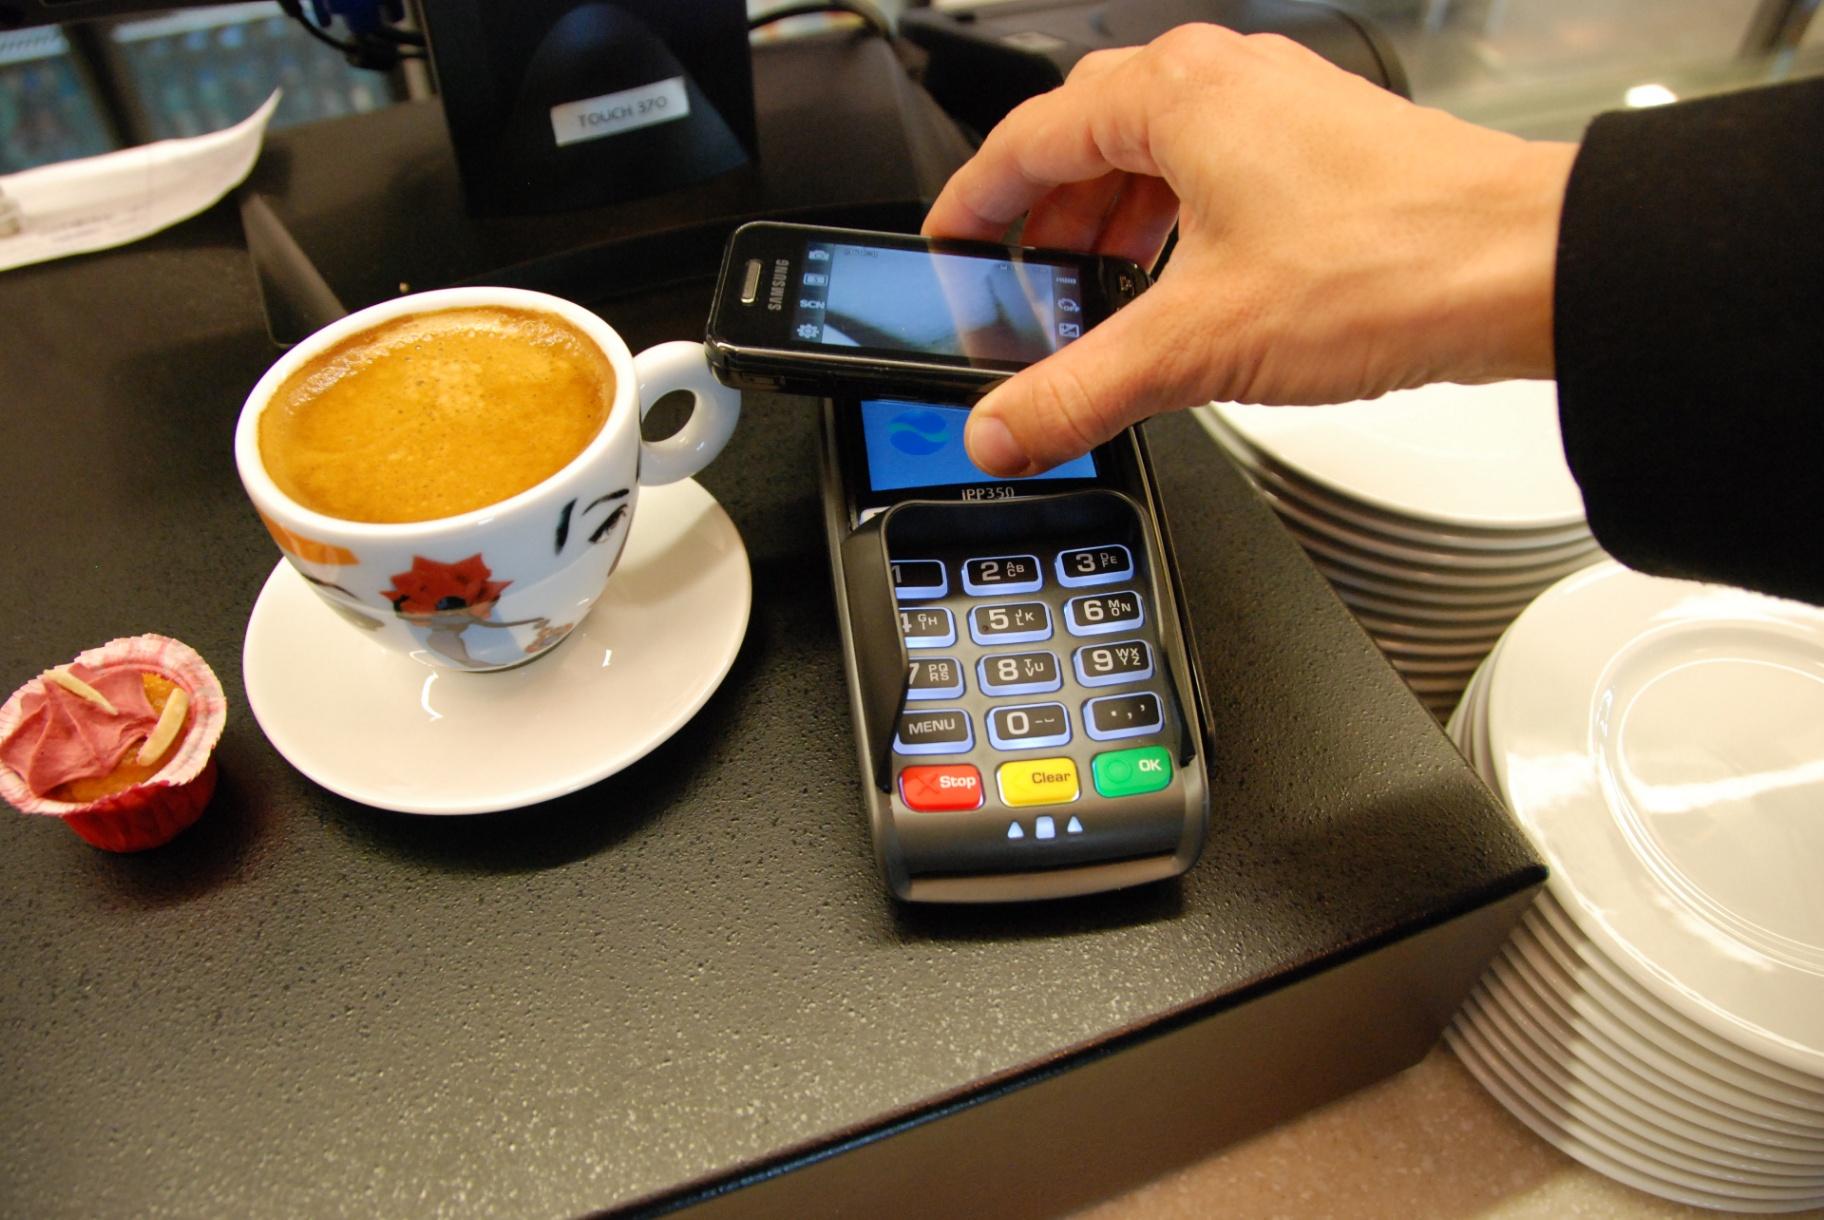 Raiffeisenbank Gold Card - Alle Infos Zur Beantragung & Den Konditionen